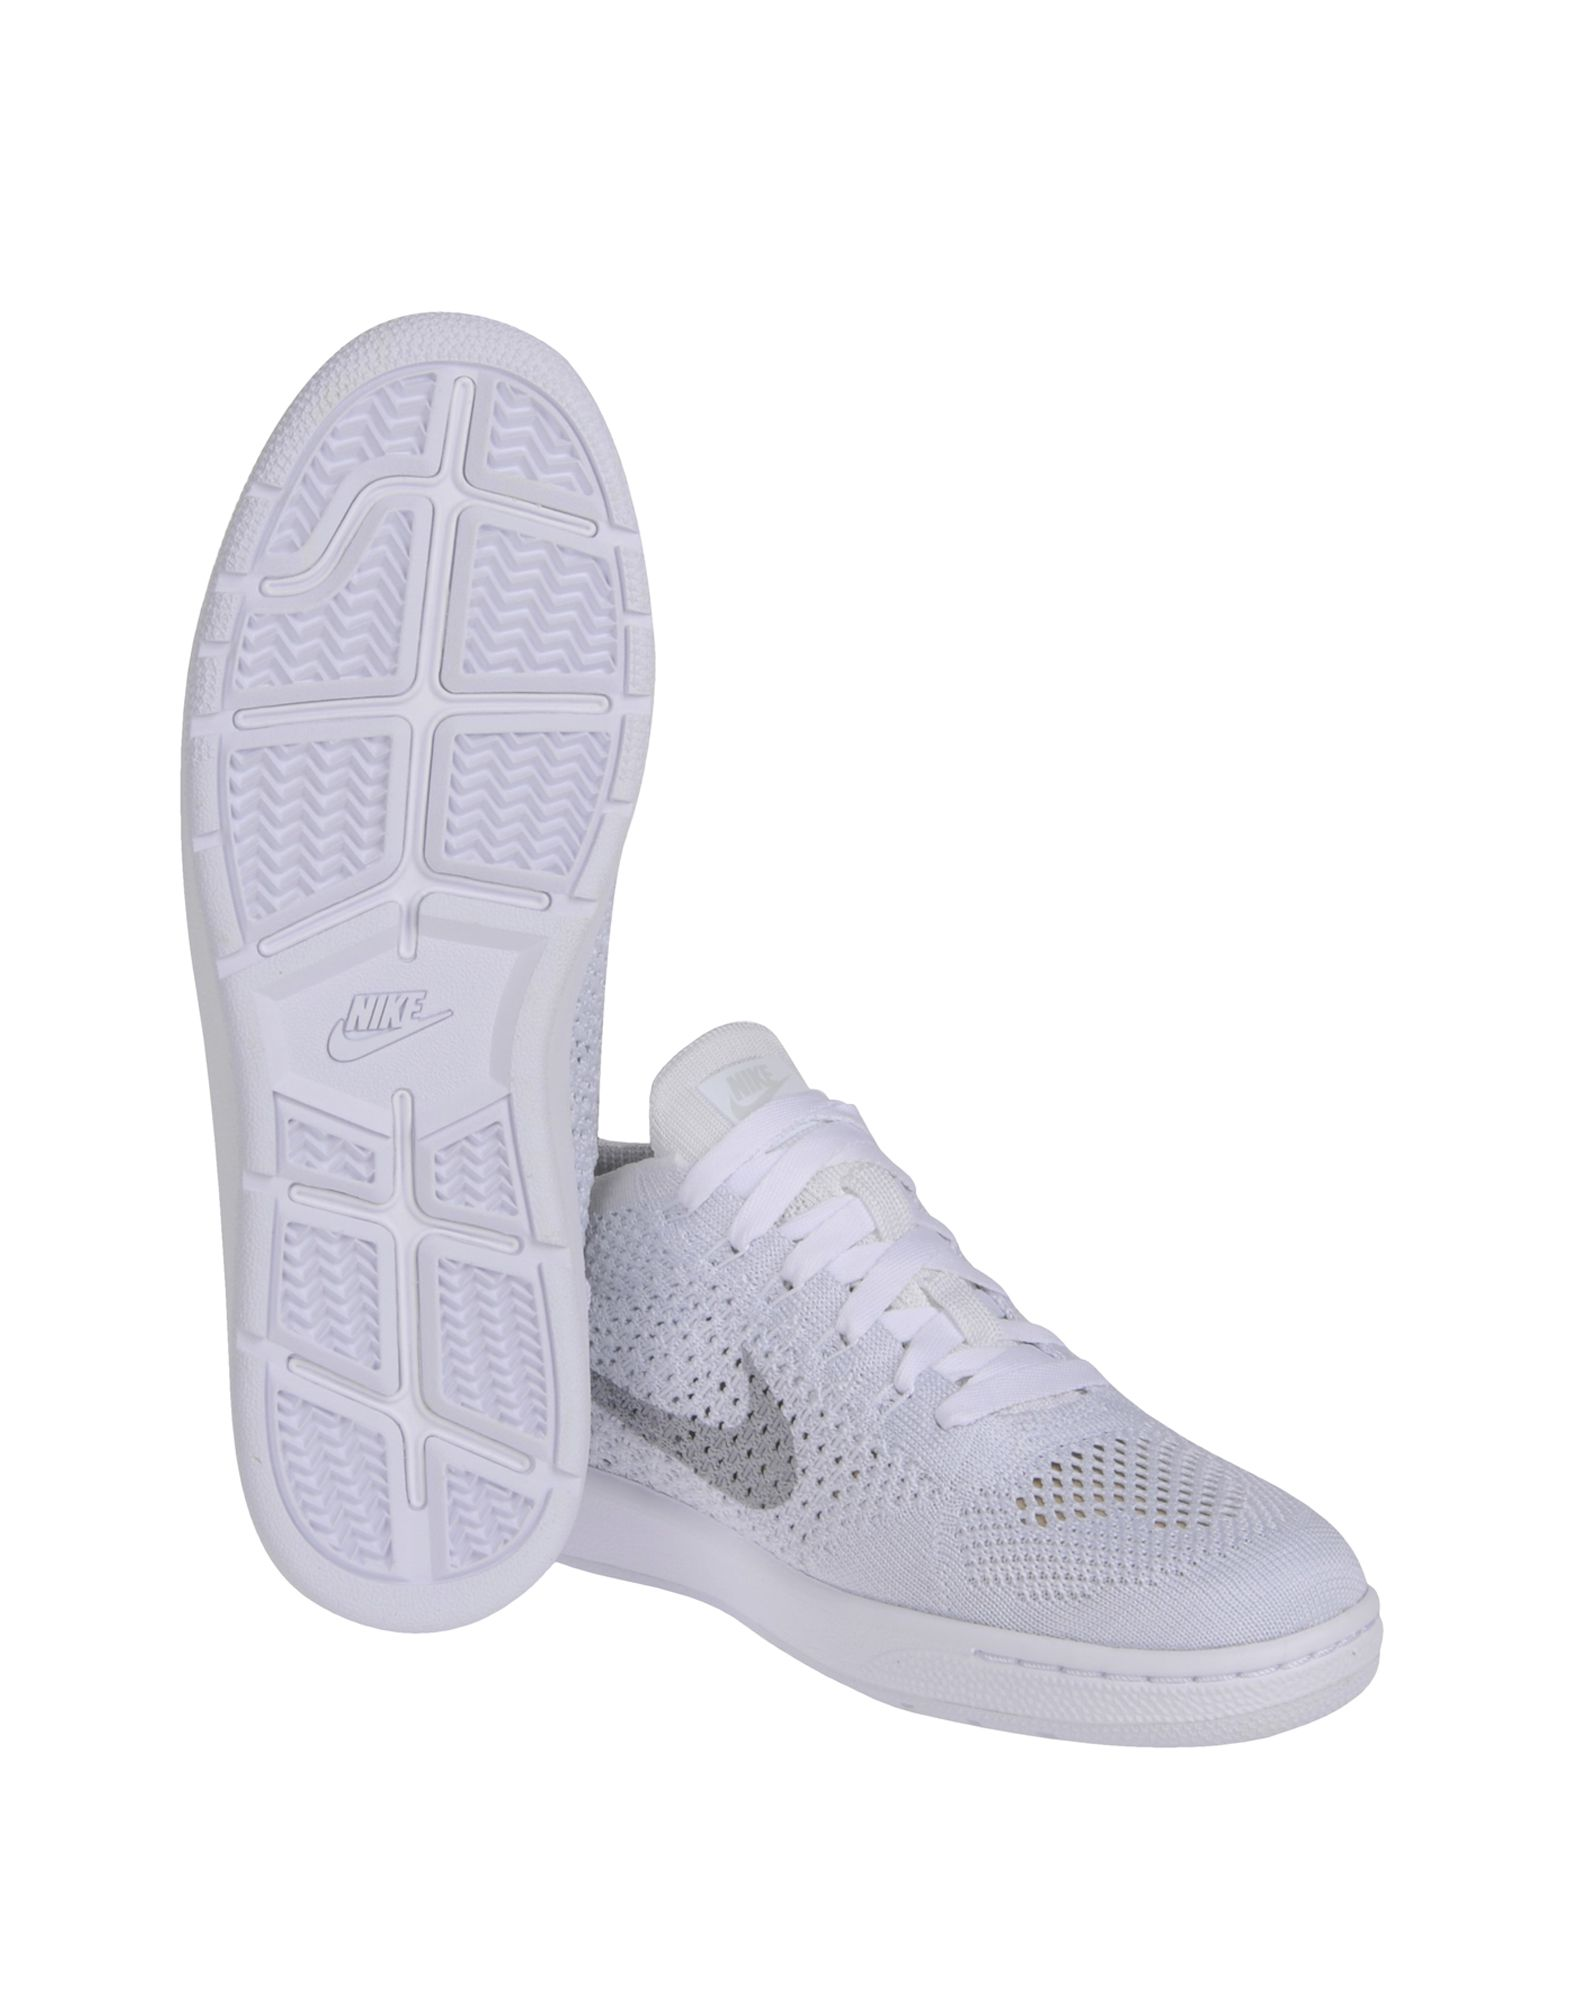 Nike W Tennis Classic Ultra Flyknit - Sneakers Sneakers Sneakers - Women Nike Sneakers online on  United Kingdom - 11085335OF cc646a